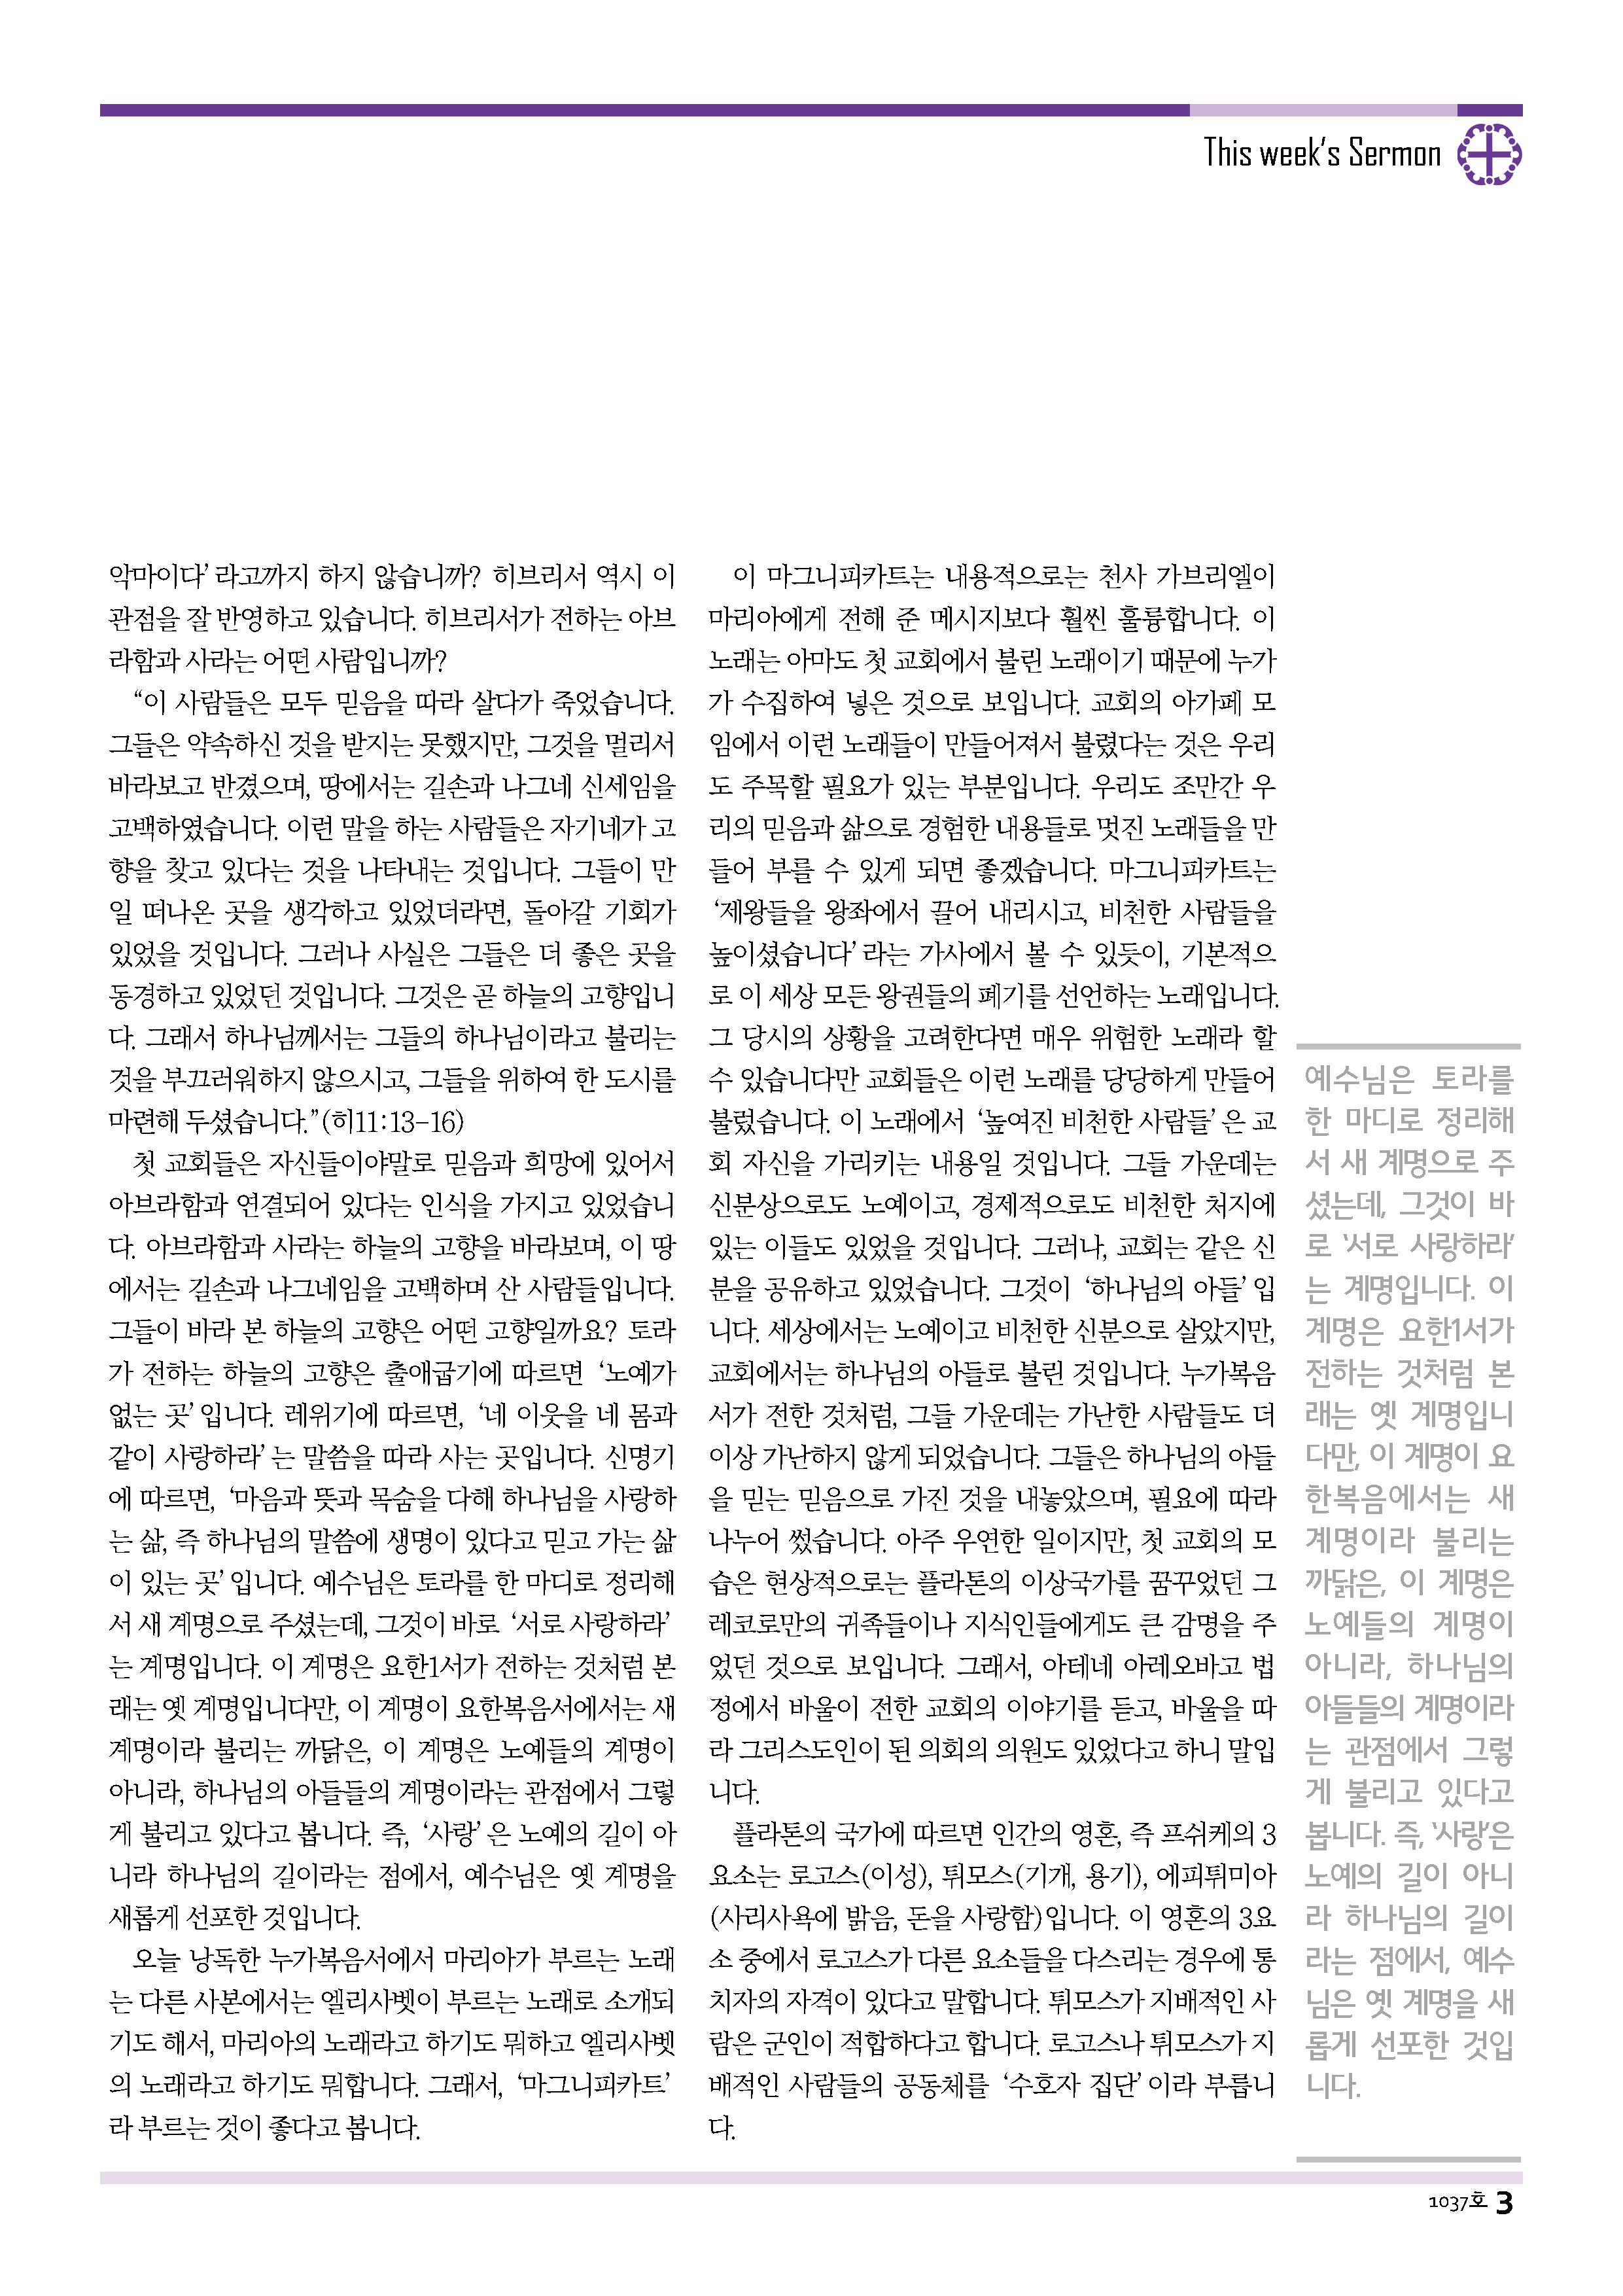 17sdjb1224_페이지_03.png